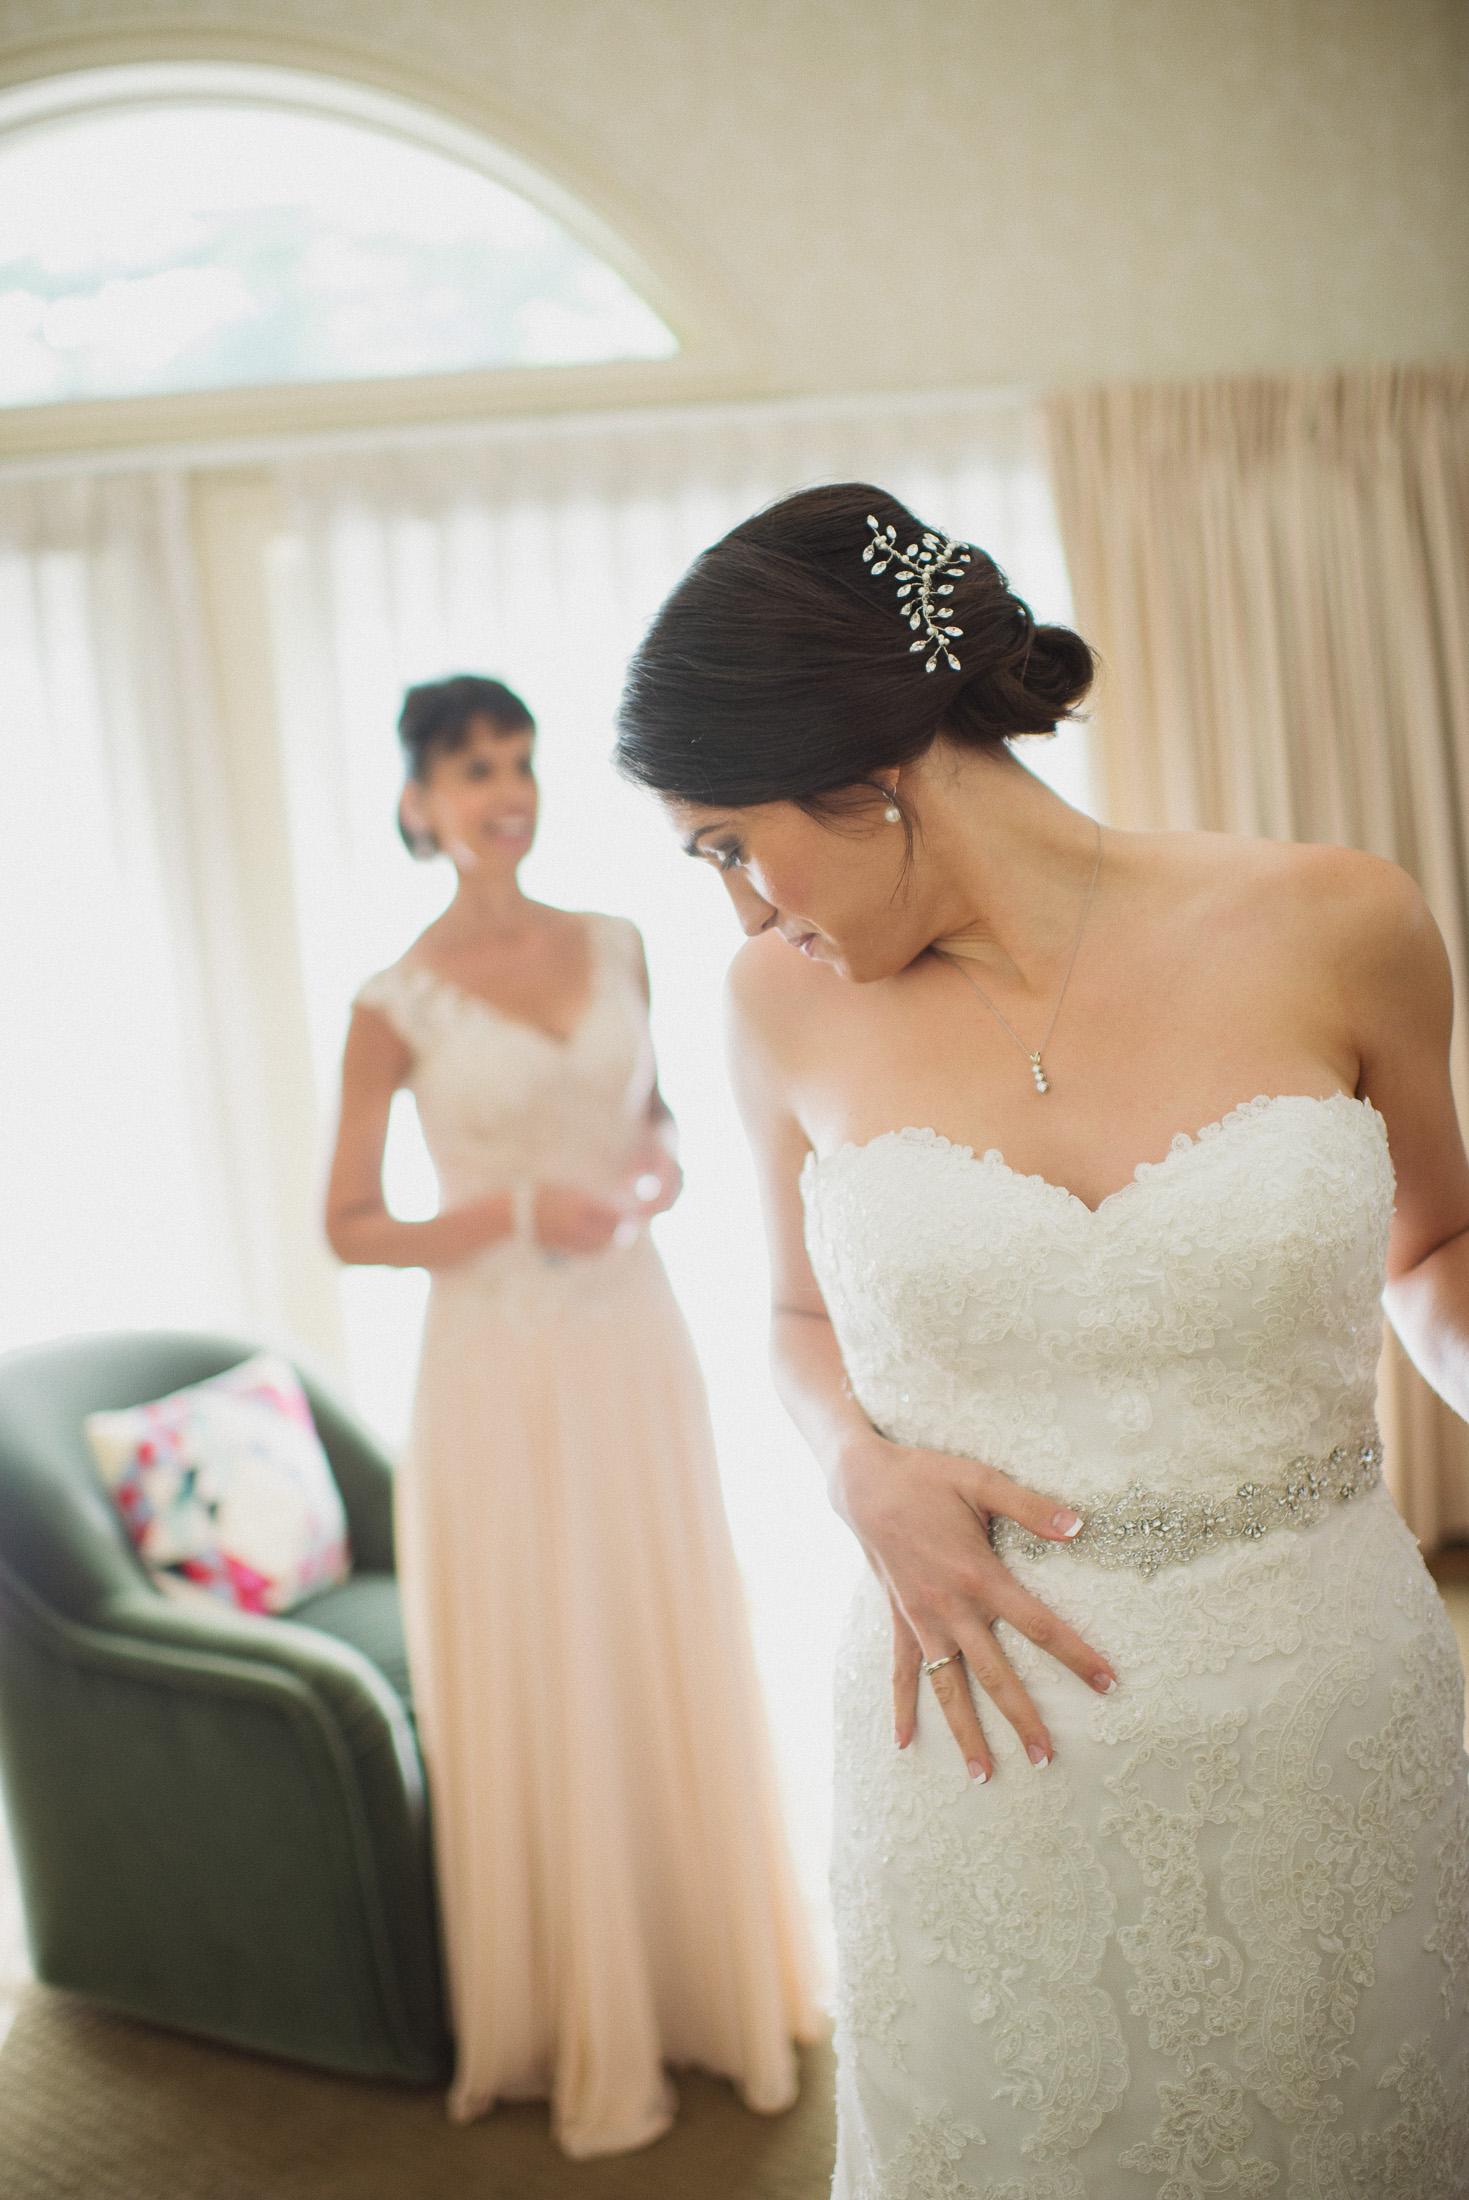 NH Wedding Photographer: BVI bride getting ready